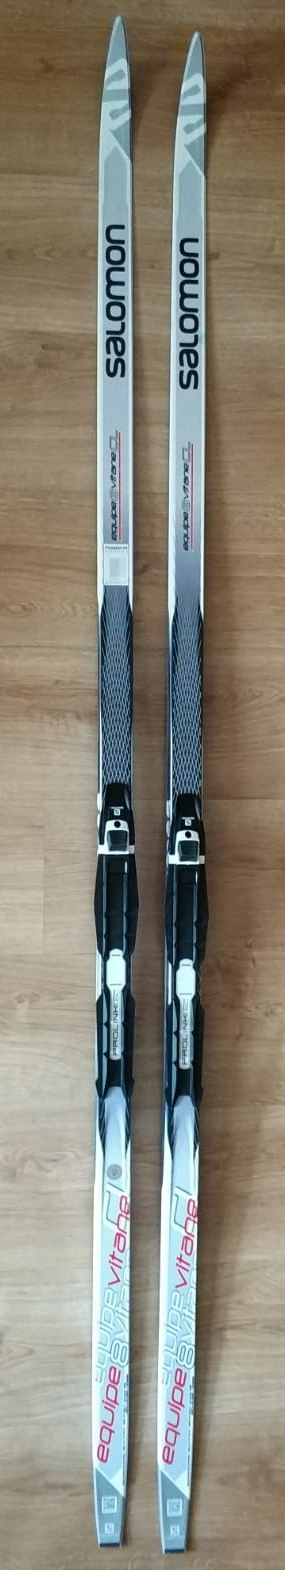 Narty biegowe Salomon Equipe 8 Vitane 188 cm